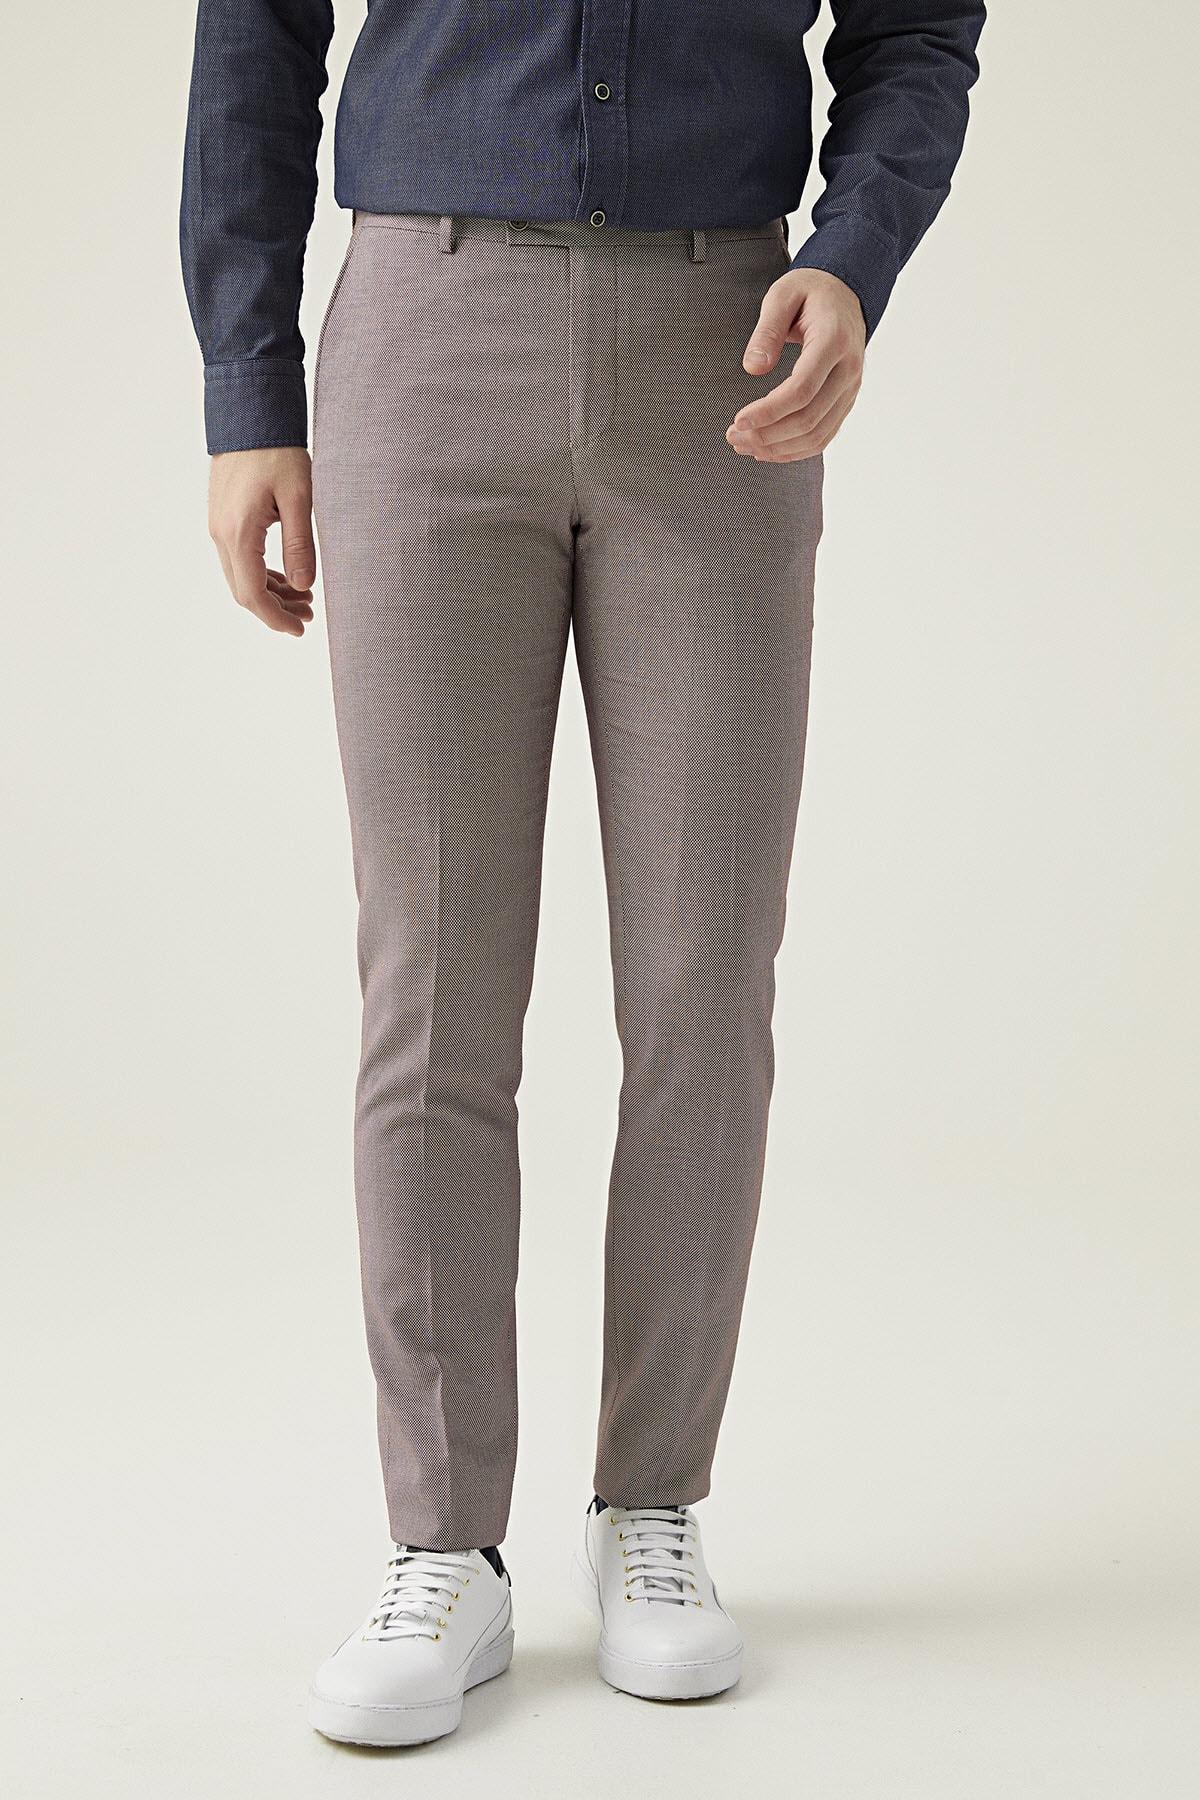 Twn Bordo Renk Erkek  Pantolon (Slim Fit) 2